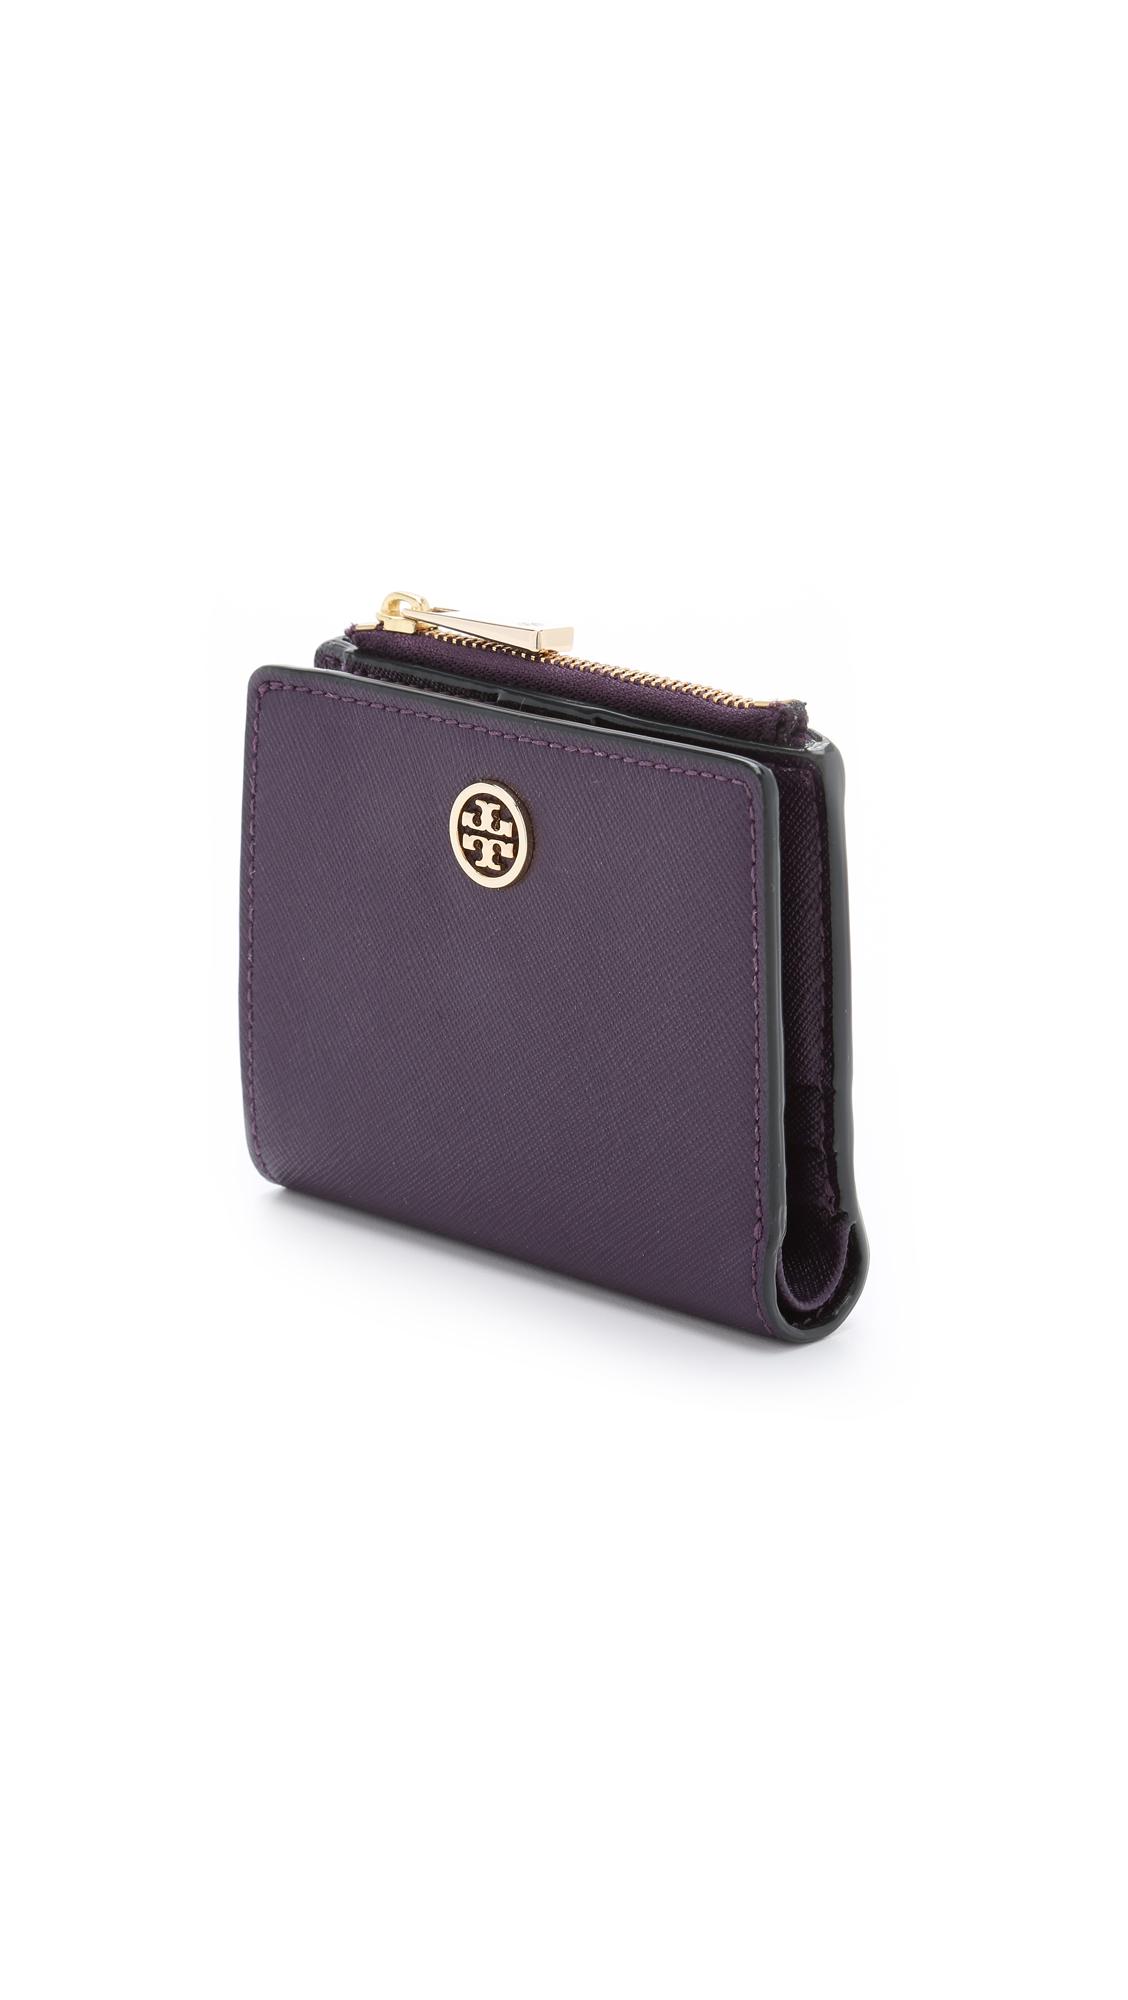 d65eb7a2757a ... wholesale lyst tory burch robinson mini wallet purple iris in purple  fa742 f4d57